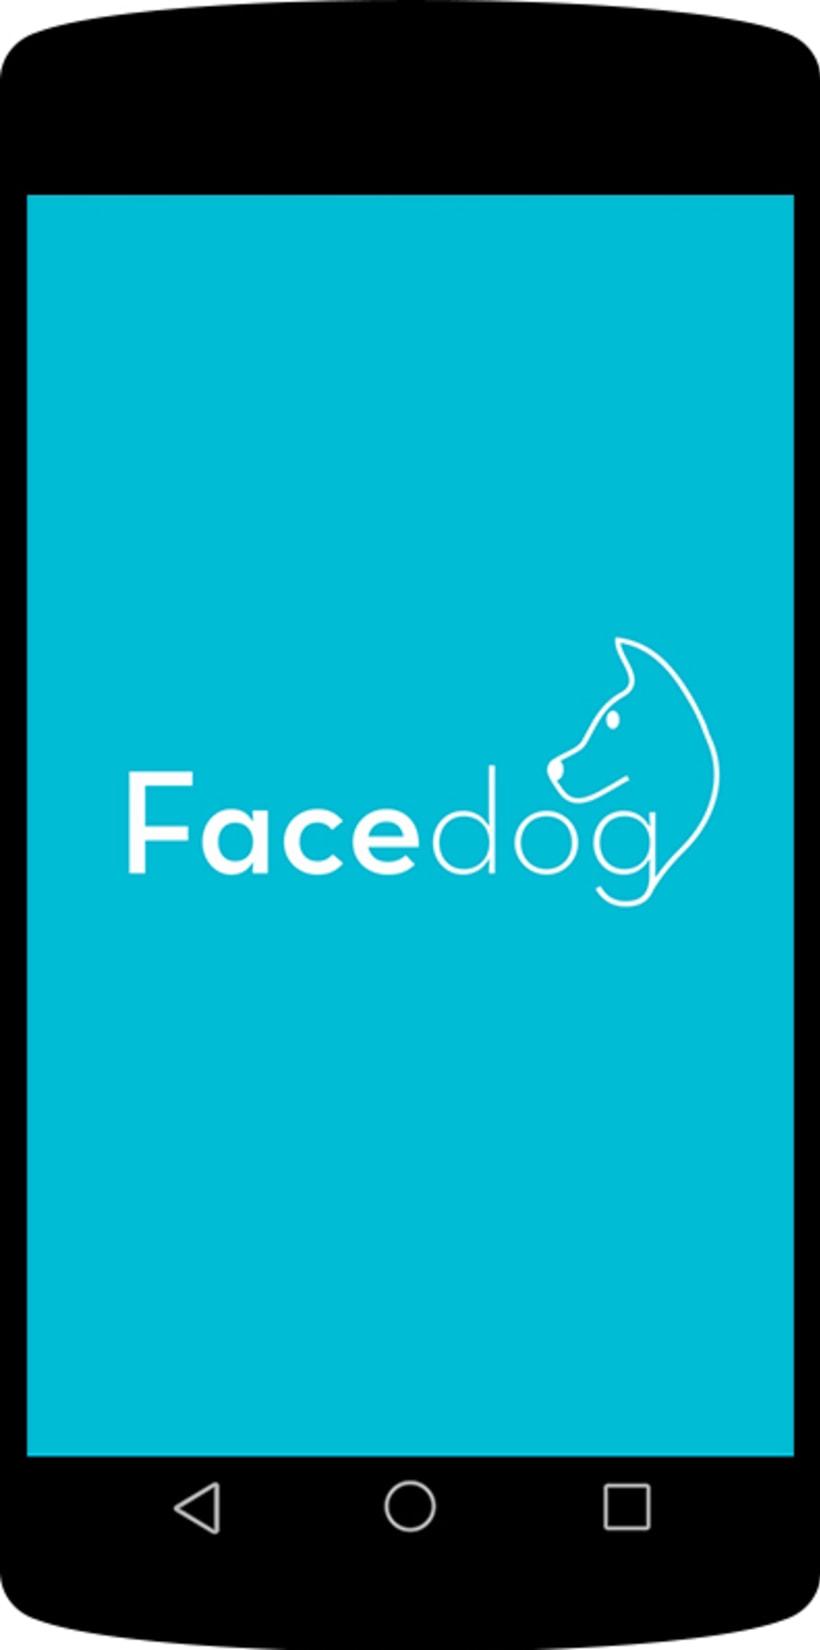 Diseño app Facedog para Android 1